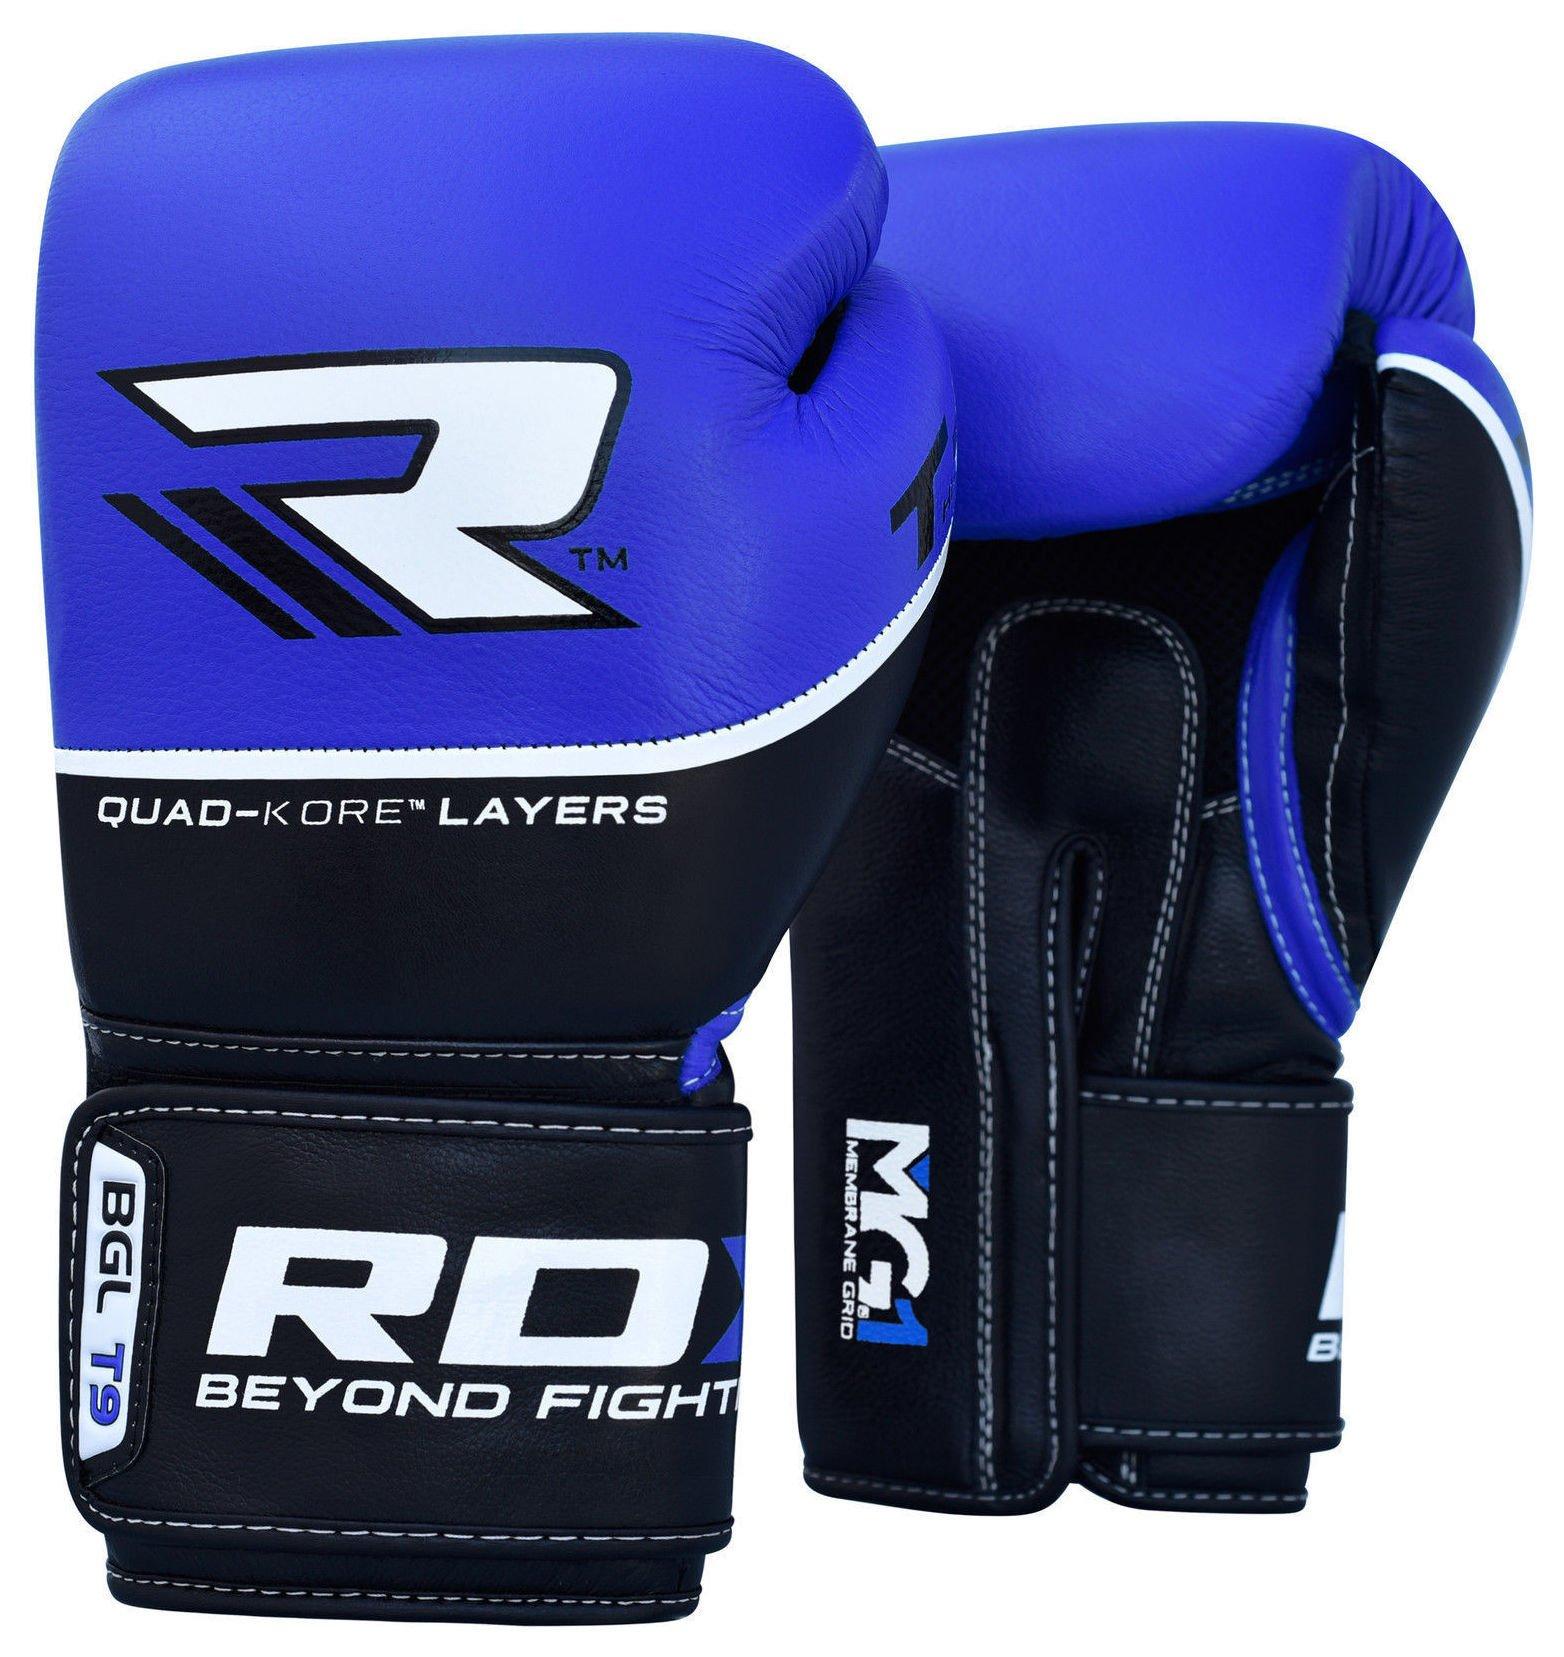 RDX Quad Kore 14oz Boxing Gloves - Blue.